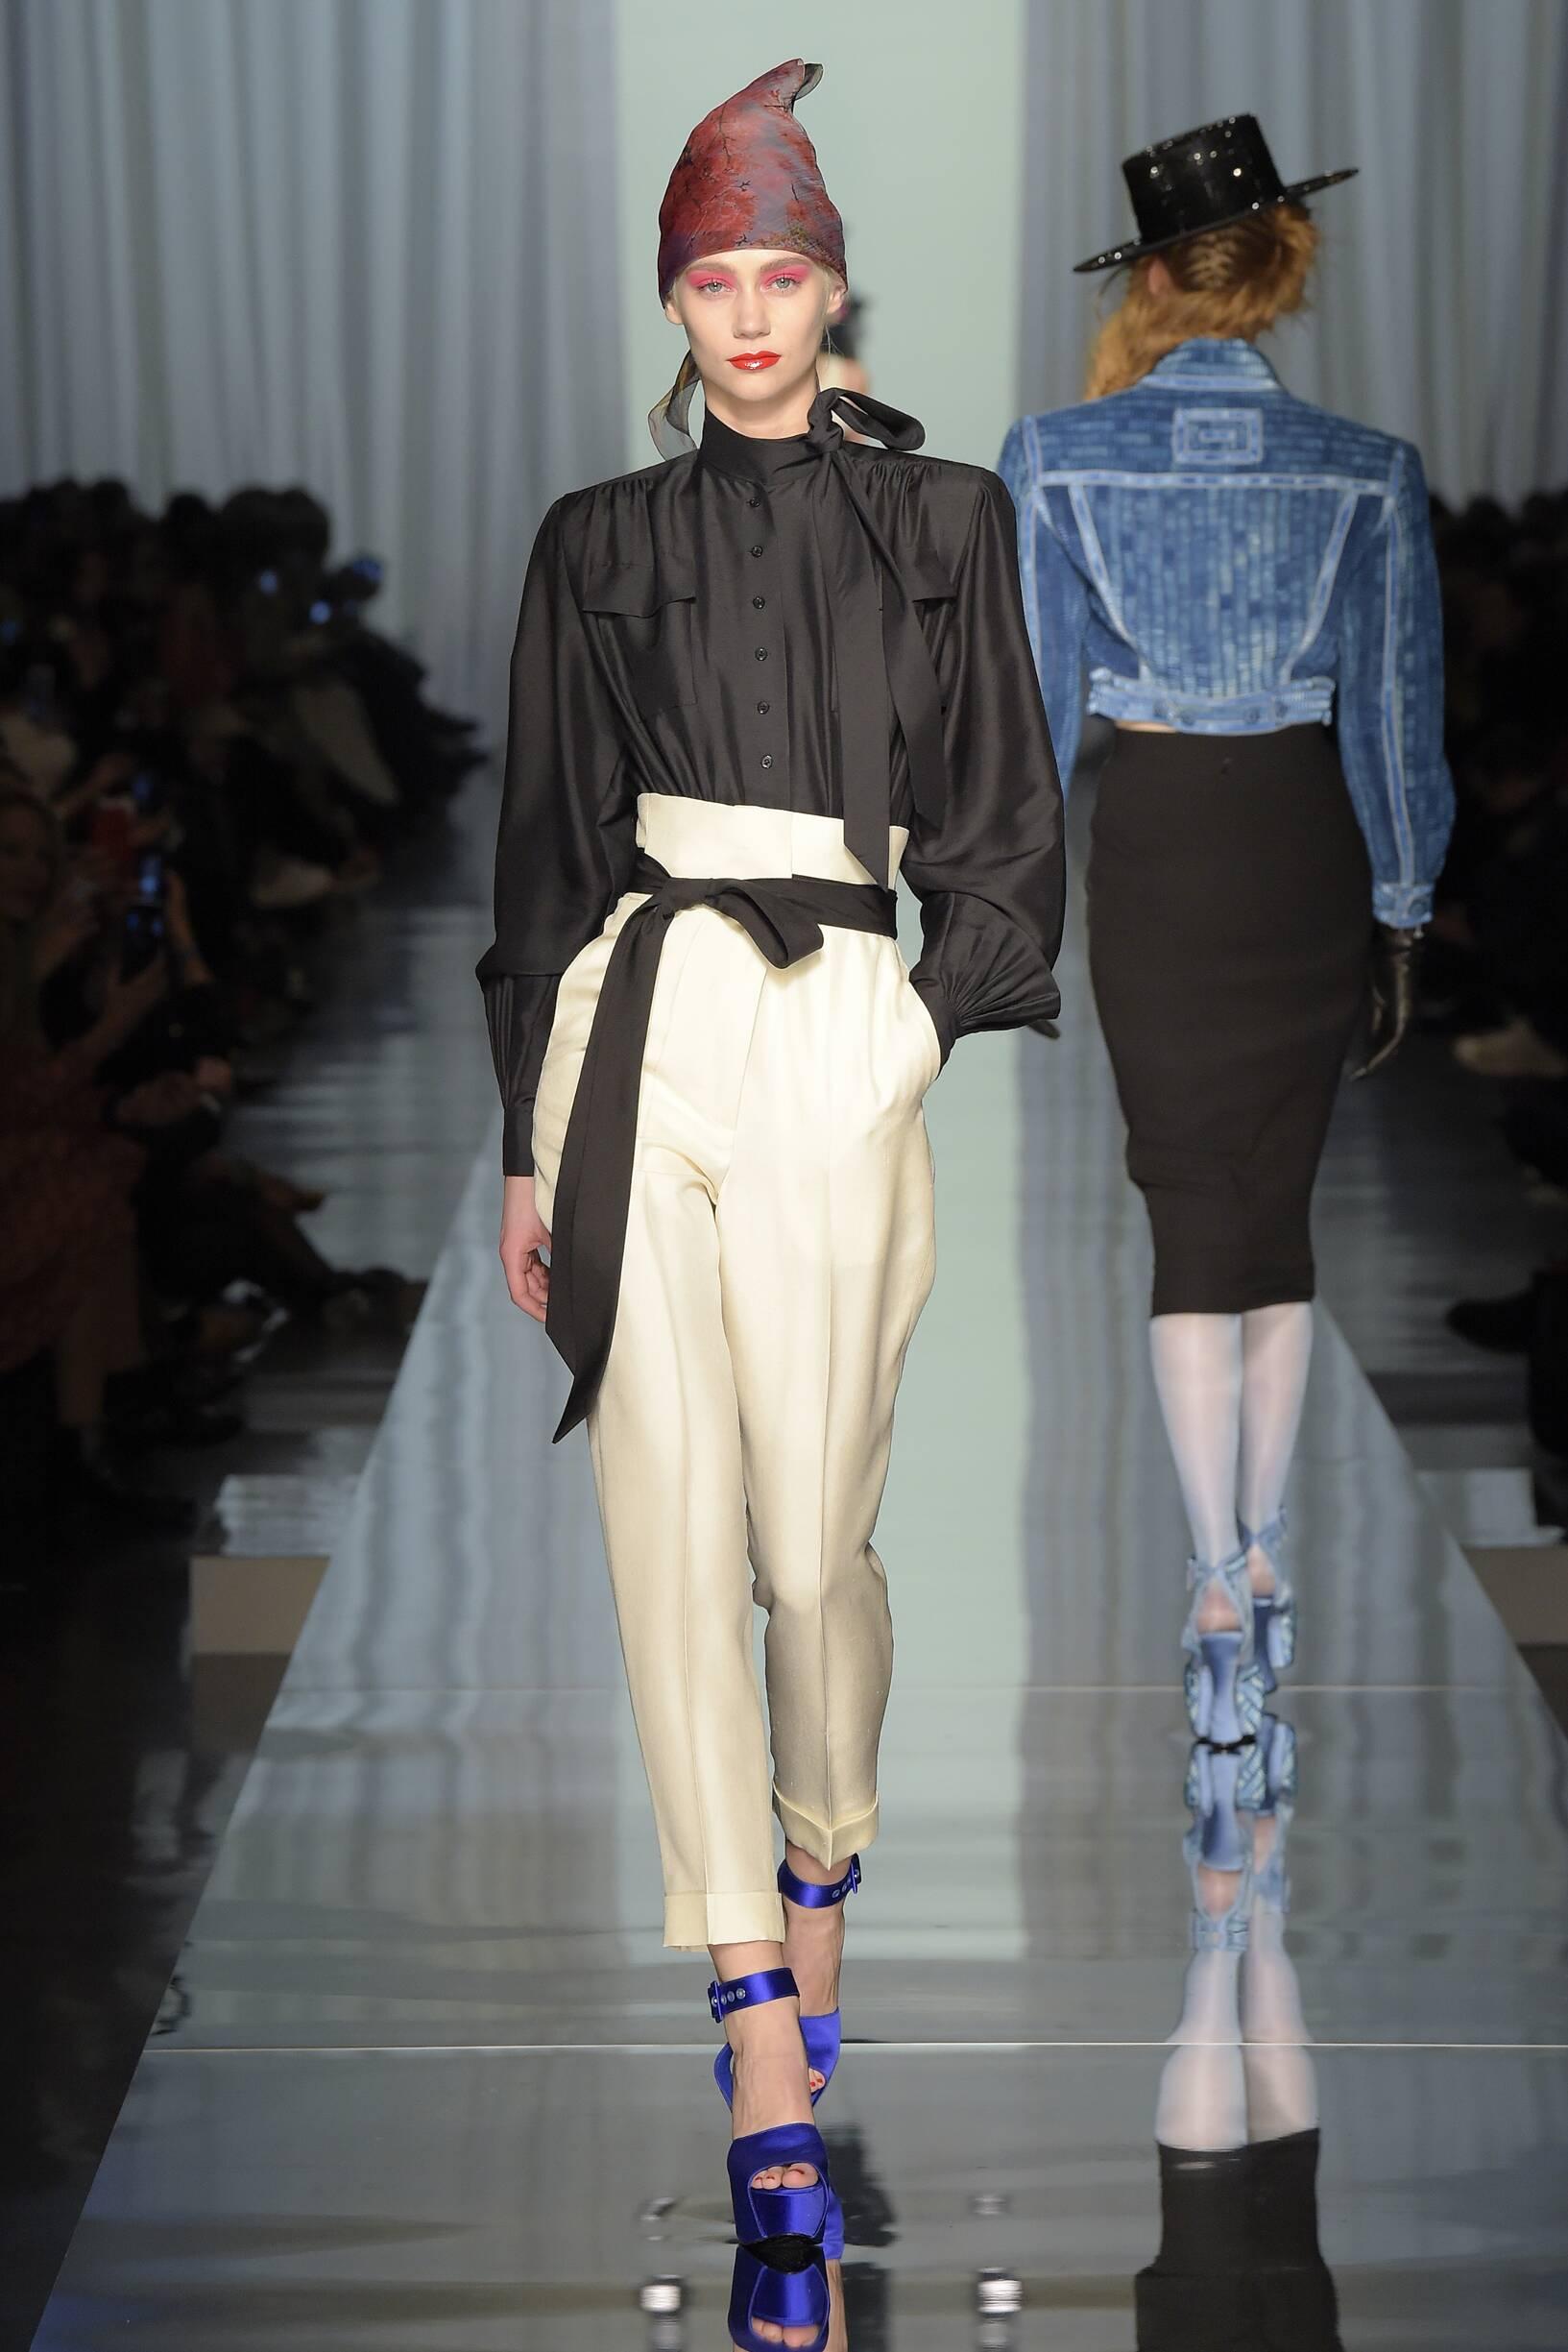 Jean Paul Gaultier Haute Couture Woman Catwalk